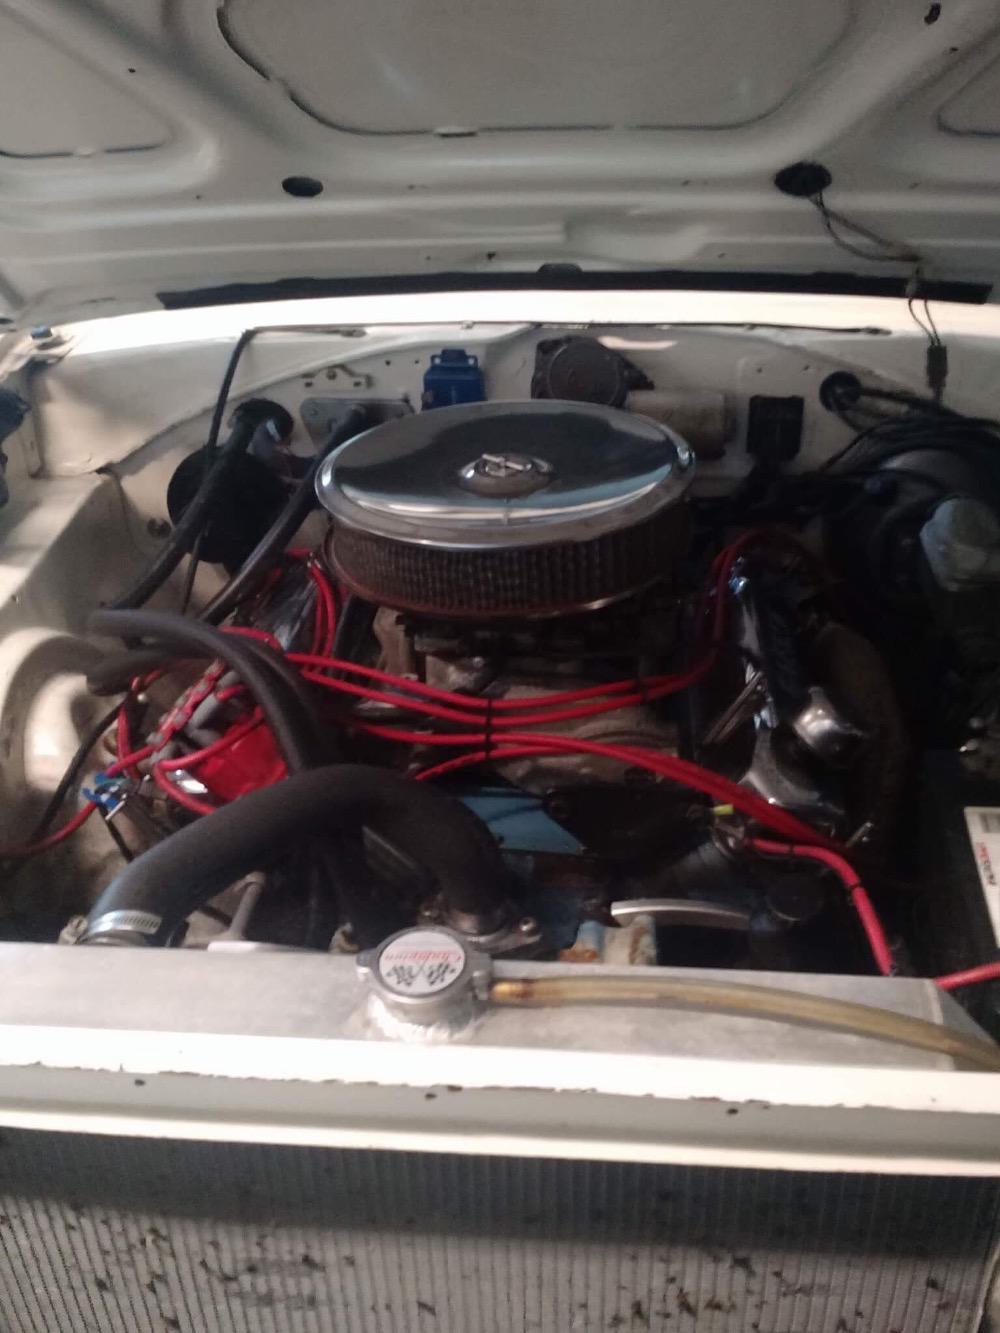 Used 1969 Dodge Charger -440 BIG BLOCK-DRIVER QUALITY MOPAR-RARE FIND | Mundelein, IL